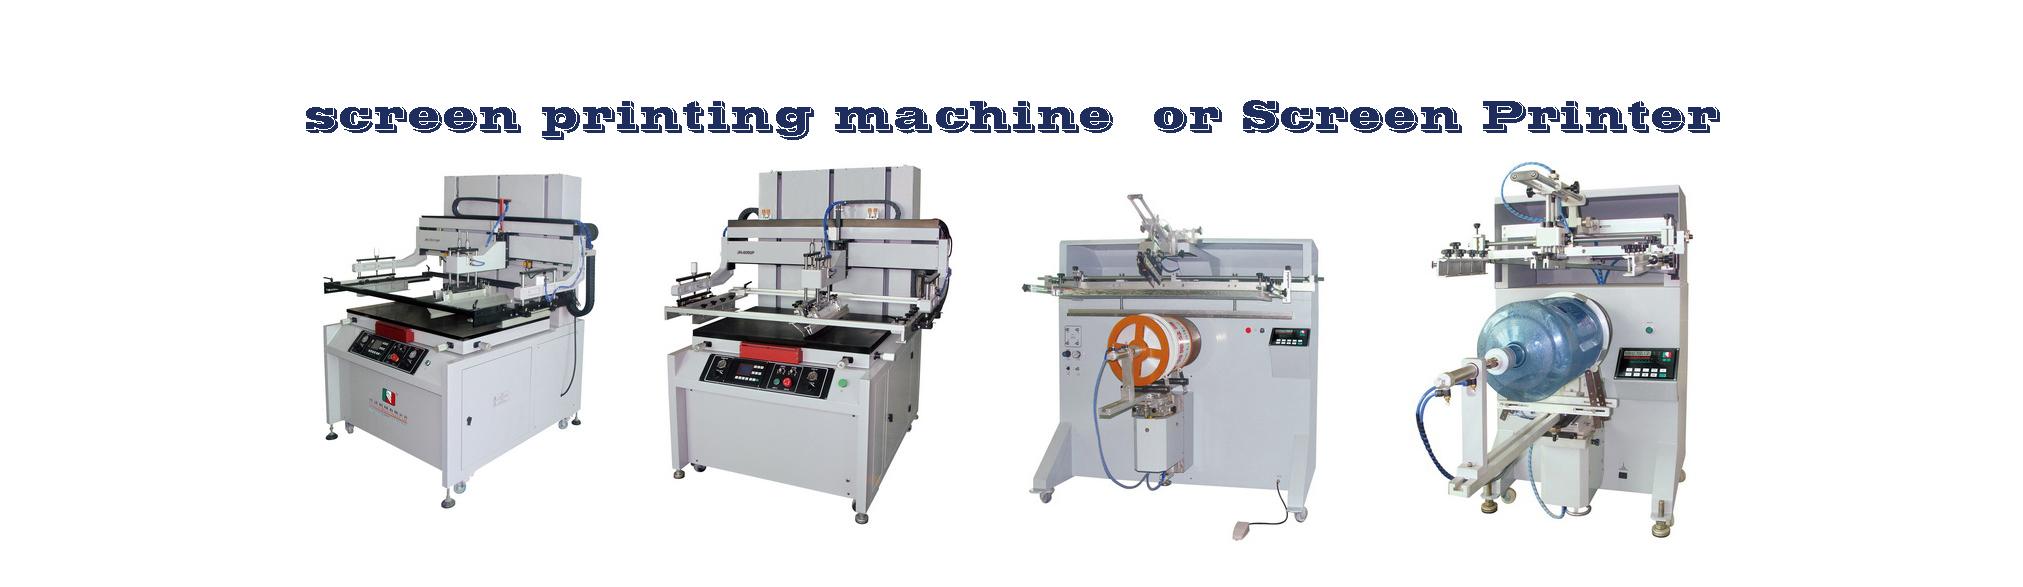 pneumatic screen printing machine